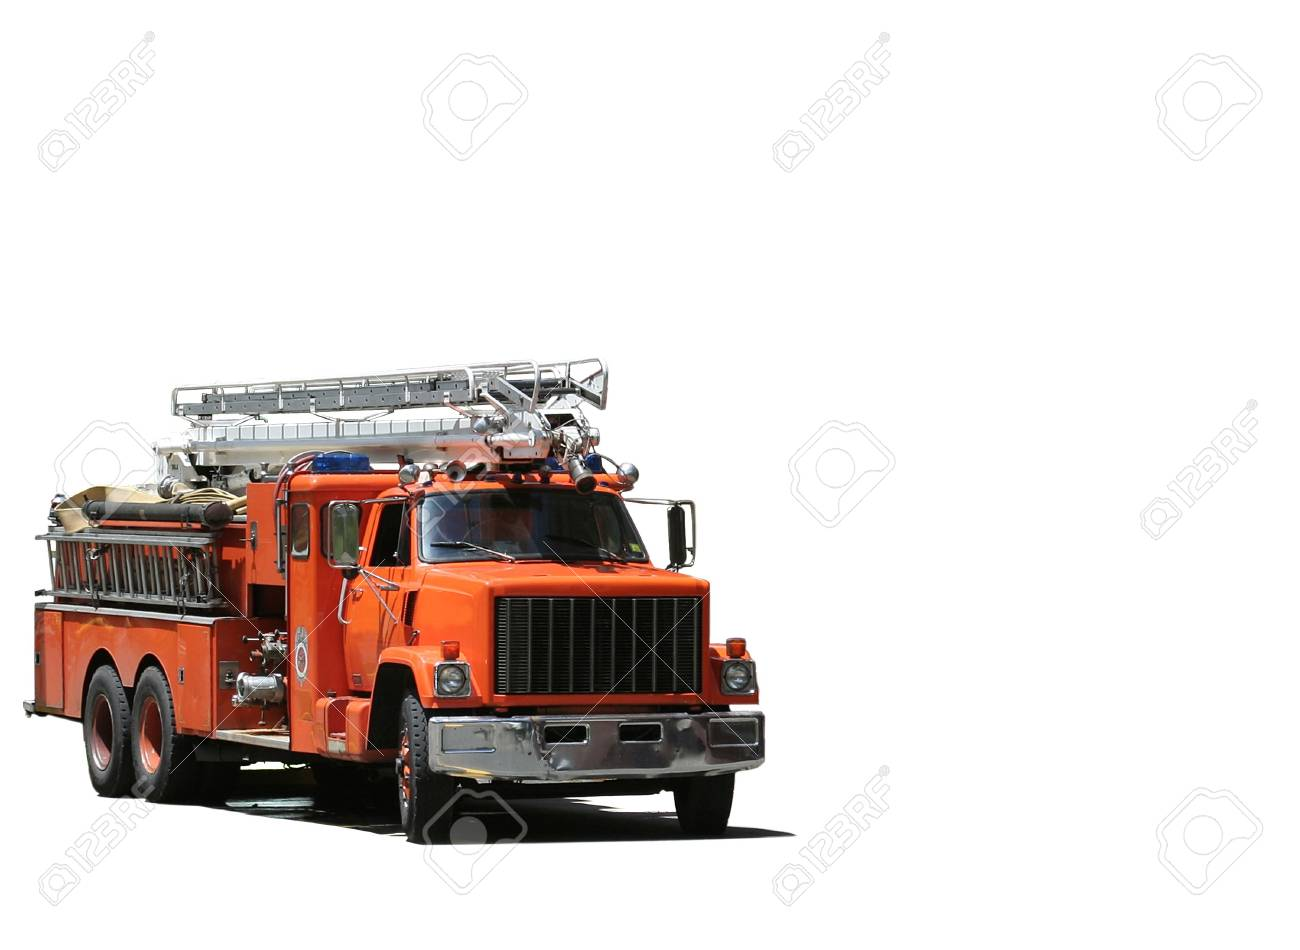 Fire Truck Stock Photo - 1914493